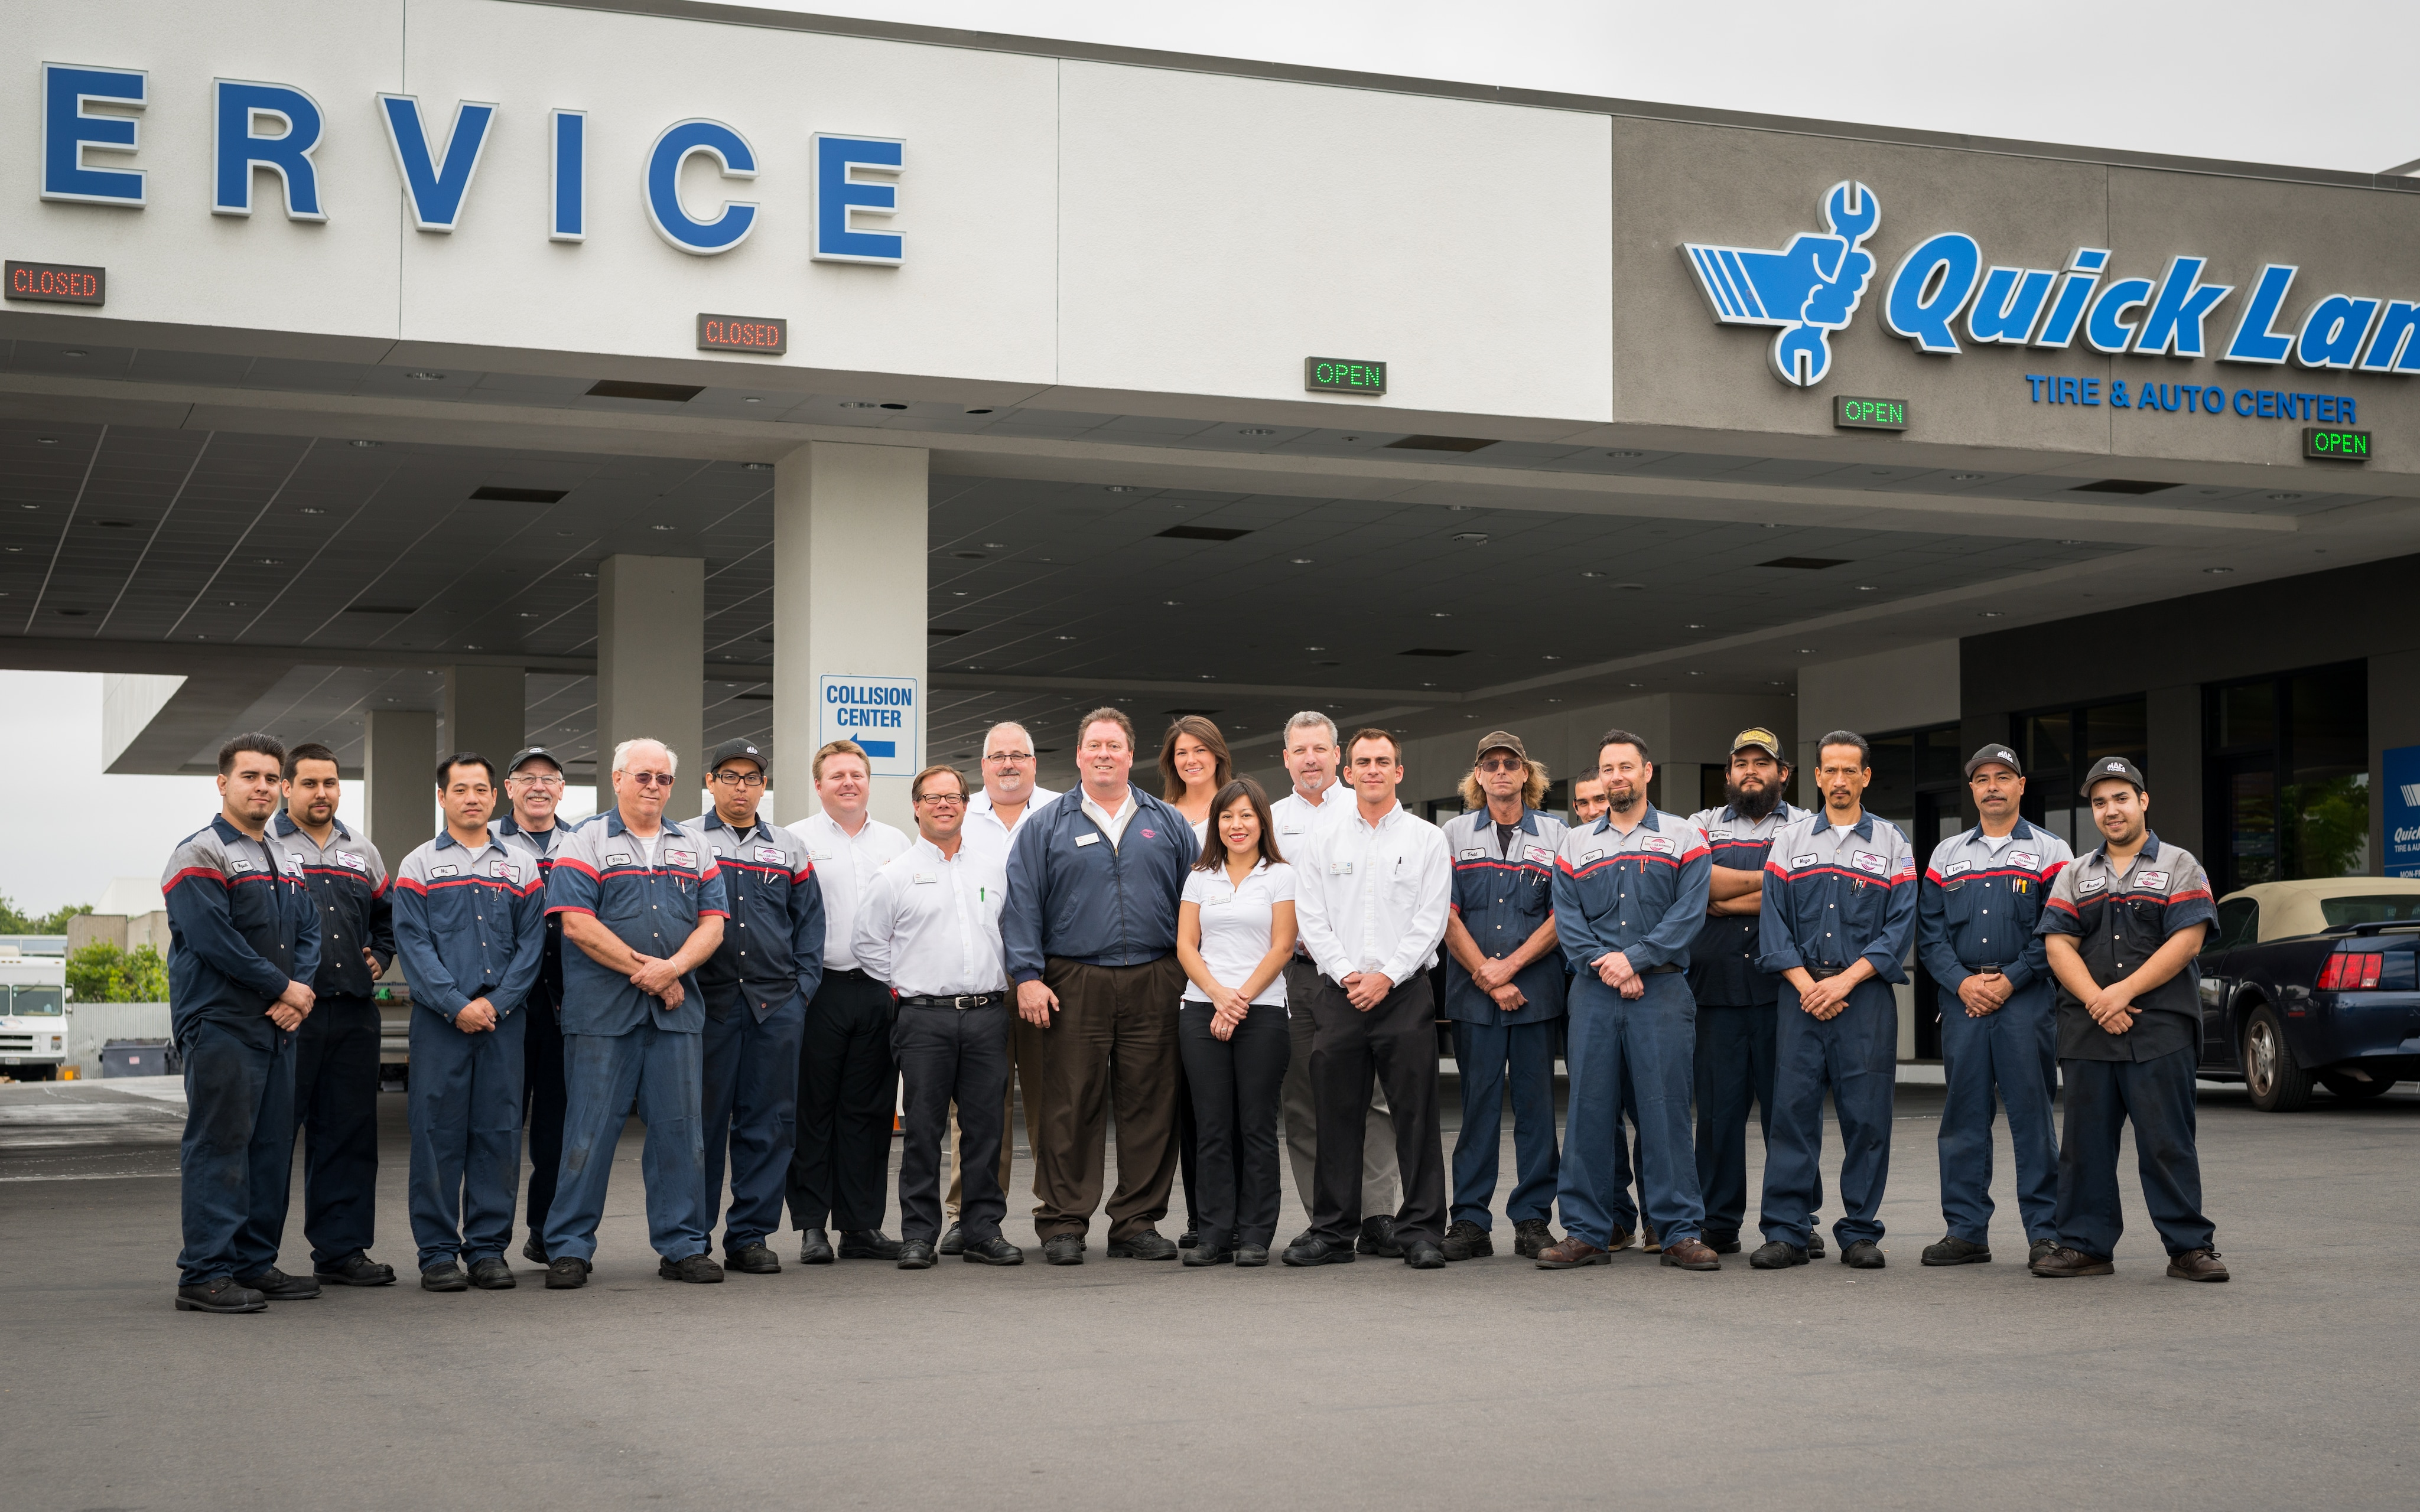 tx htm index repair maintenance in ford antonio center service san